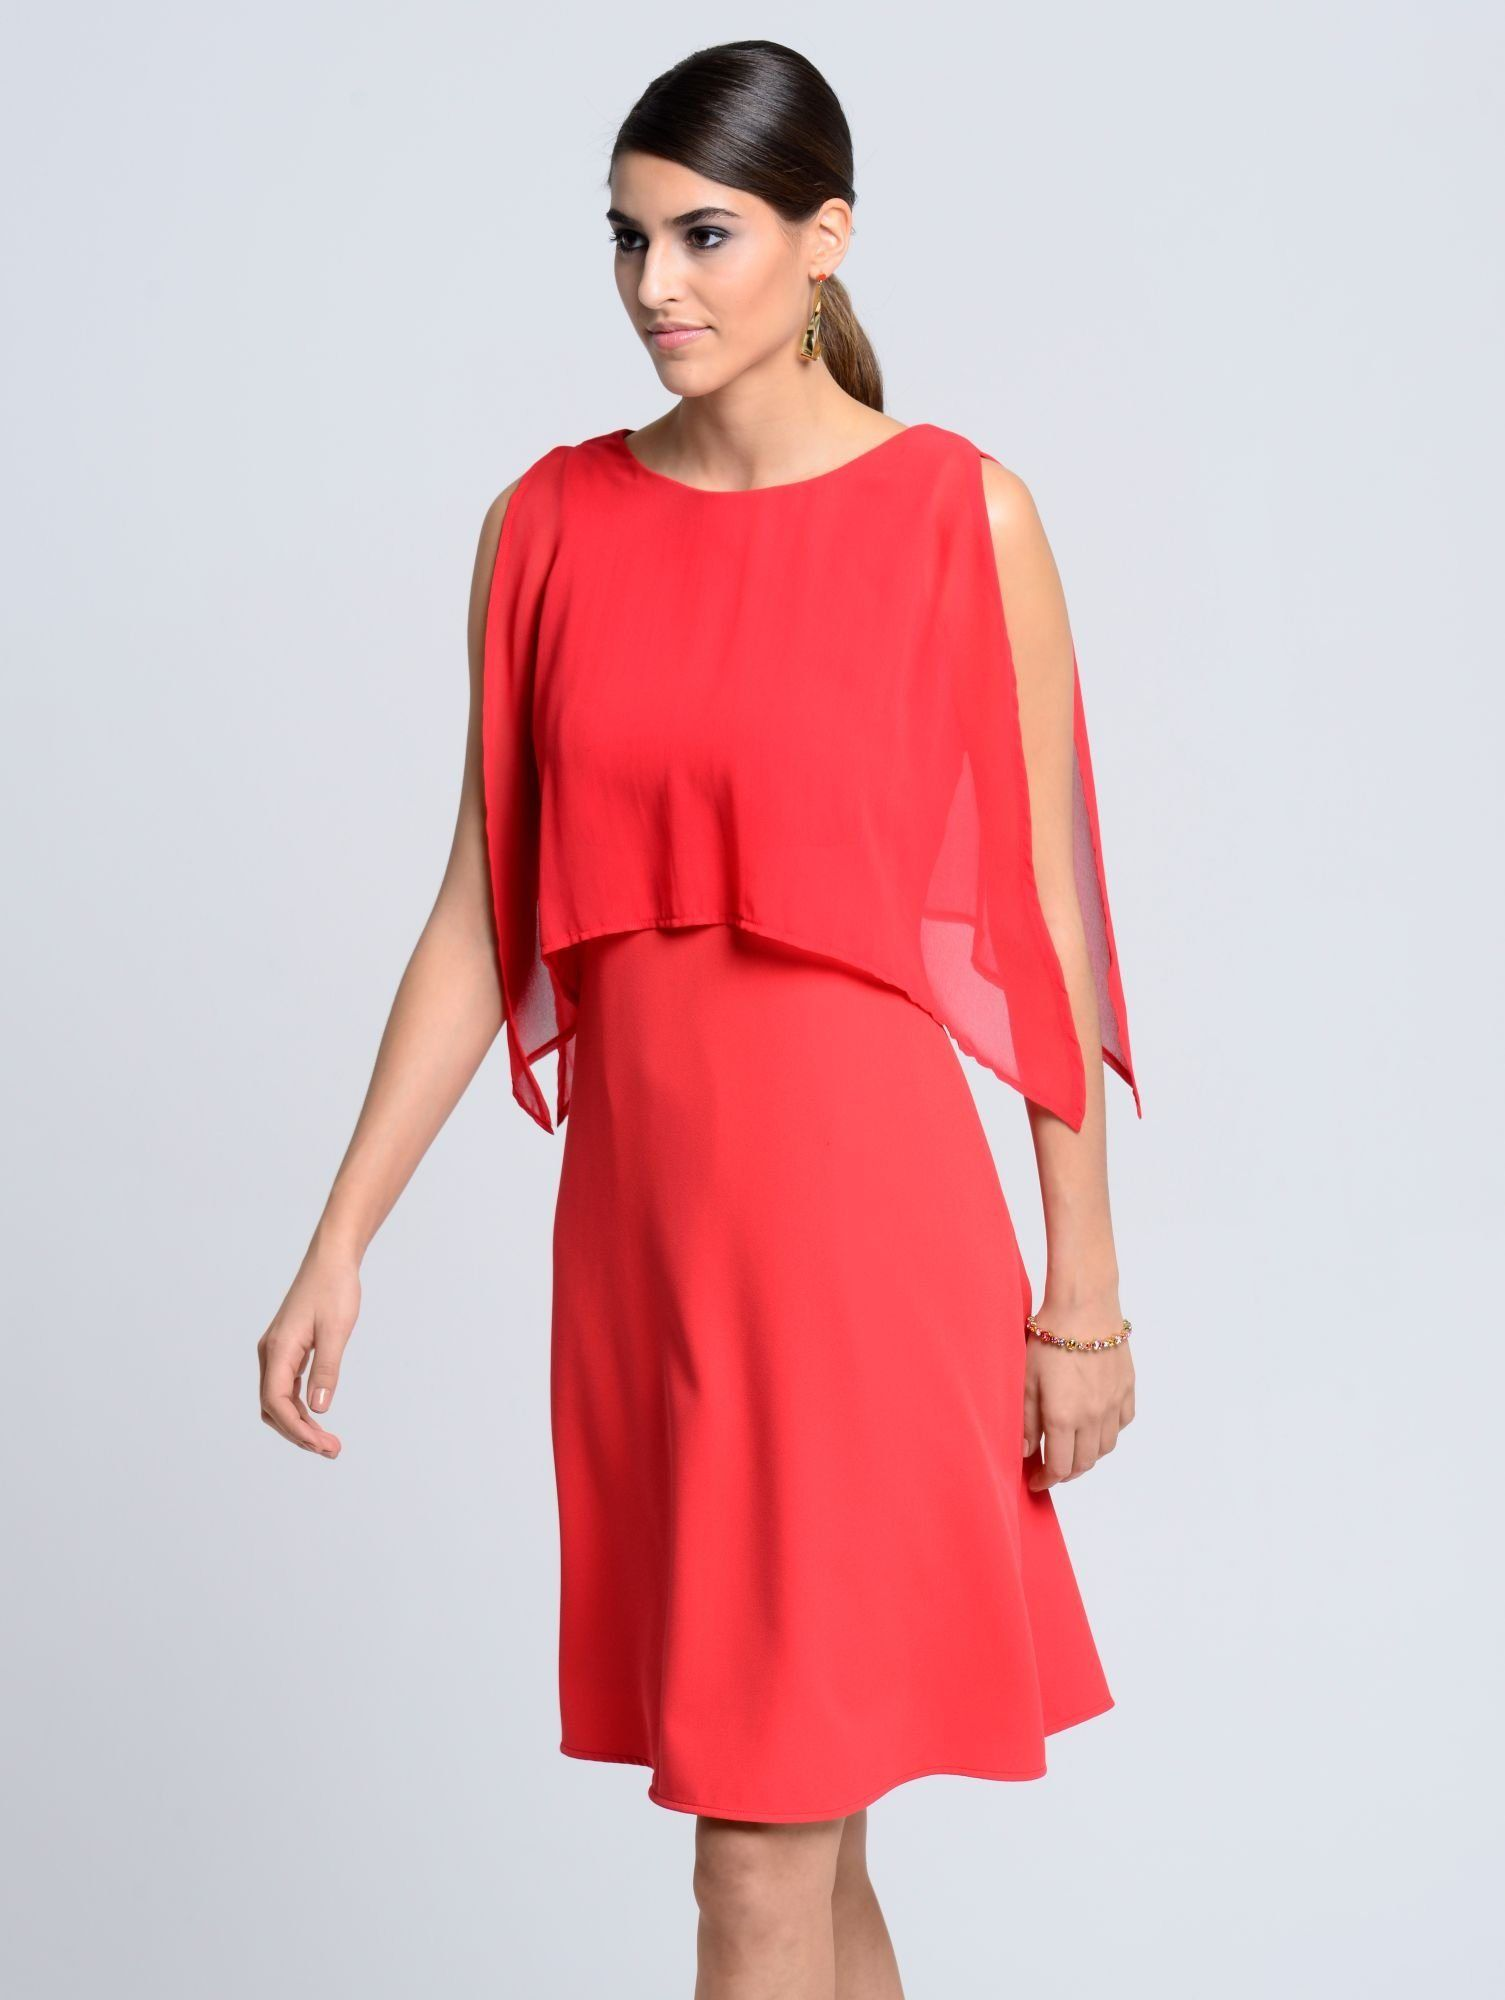 Alba moda de kleider